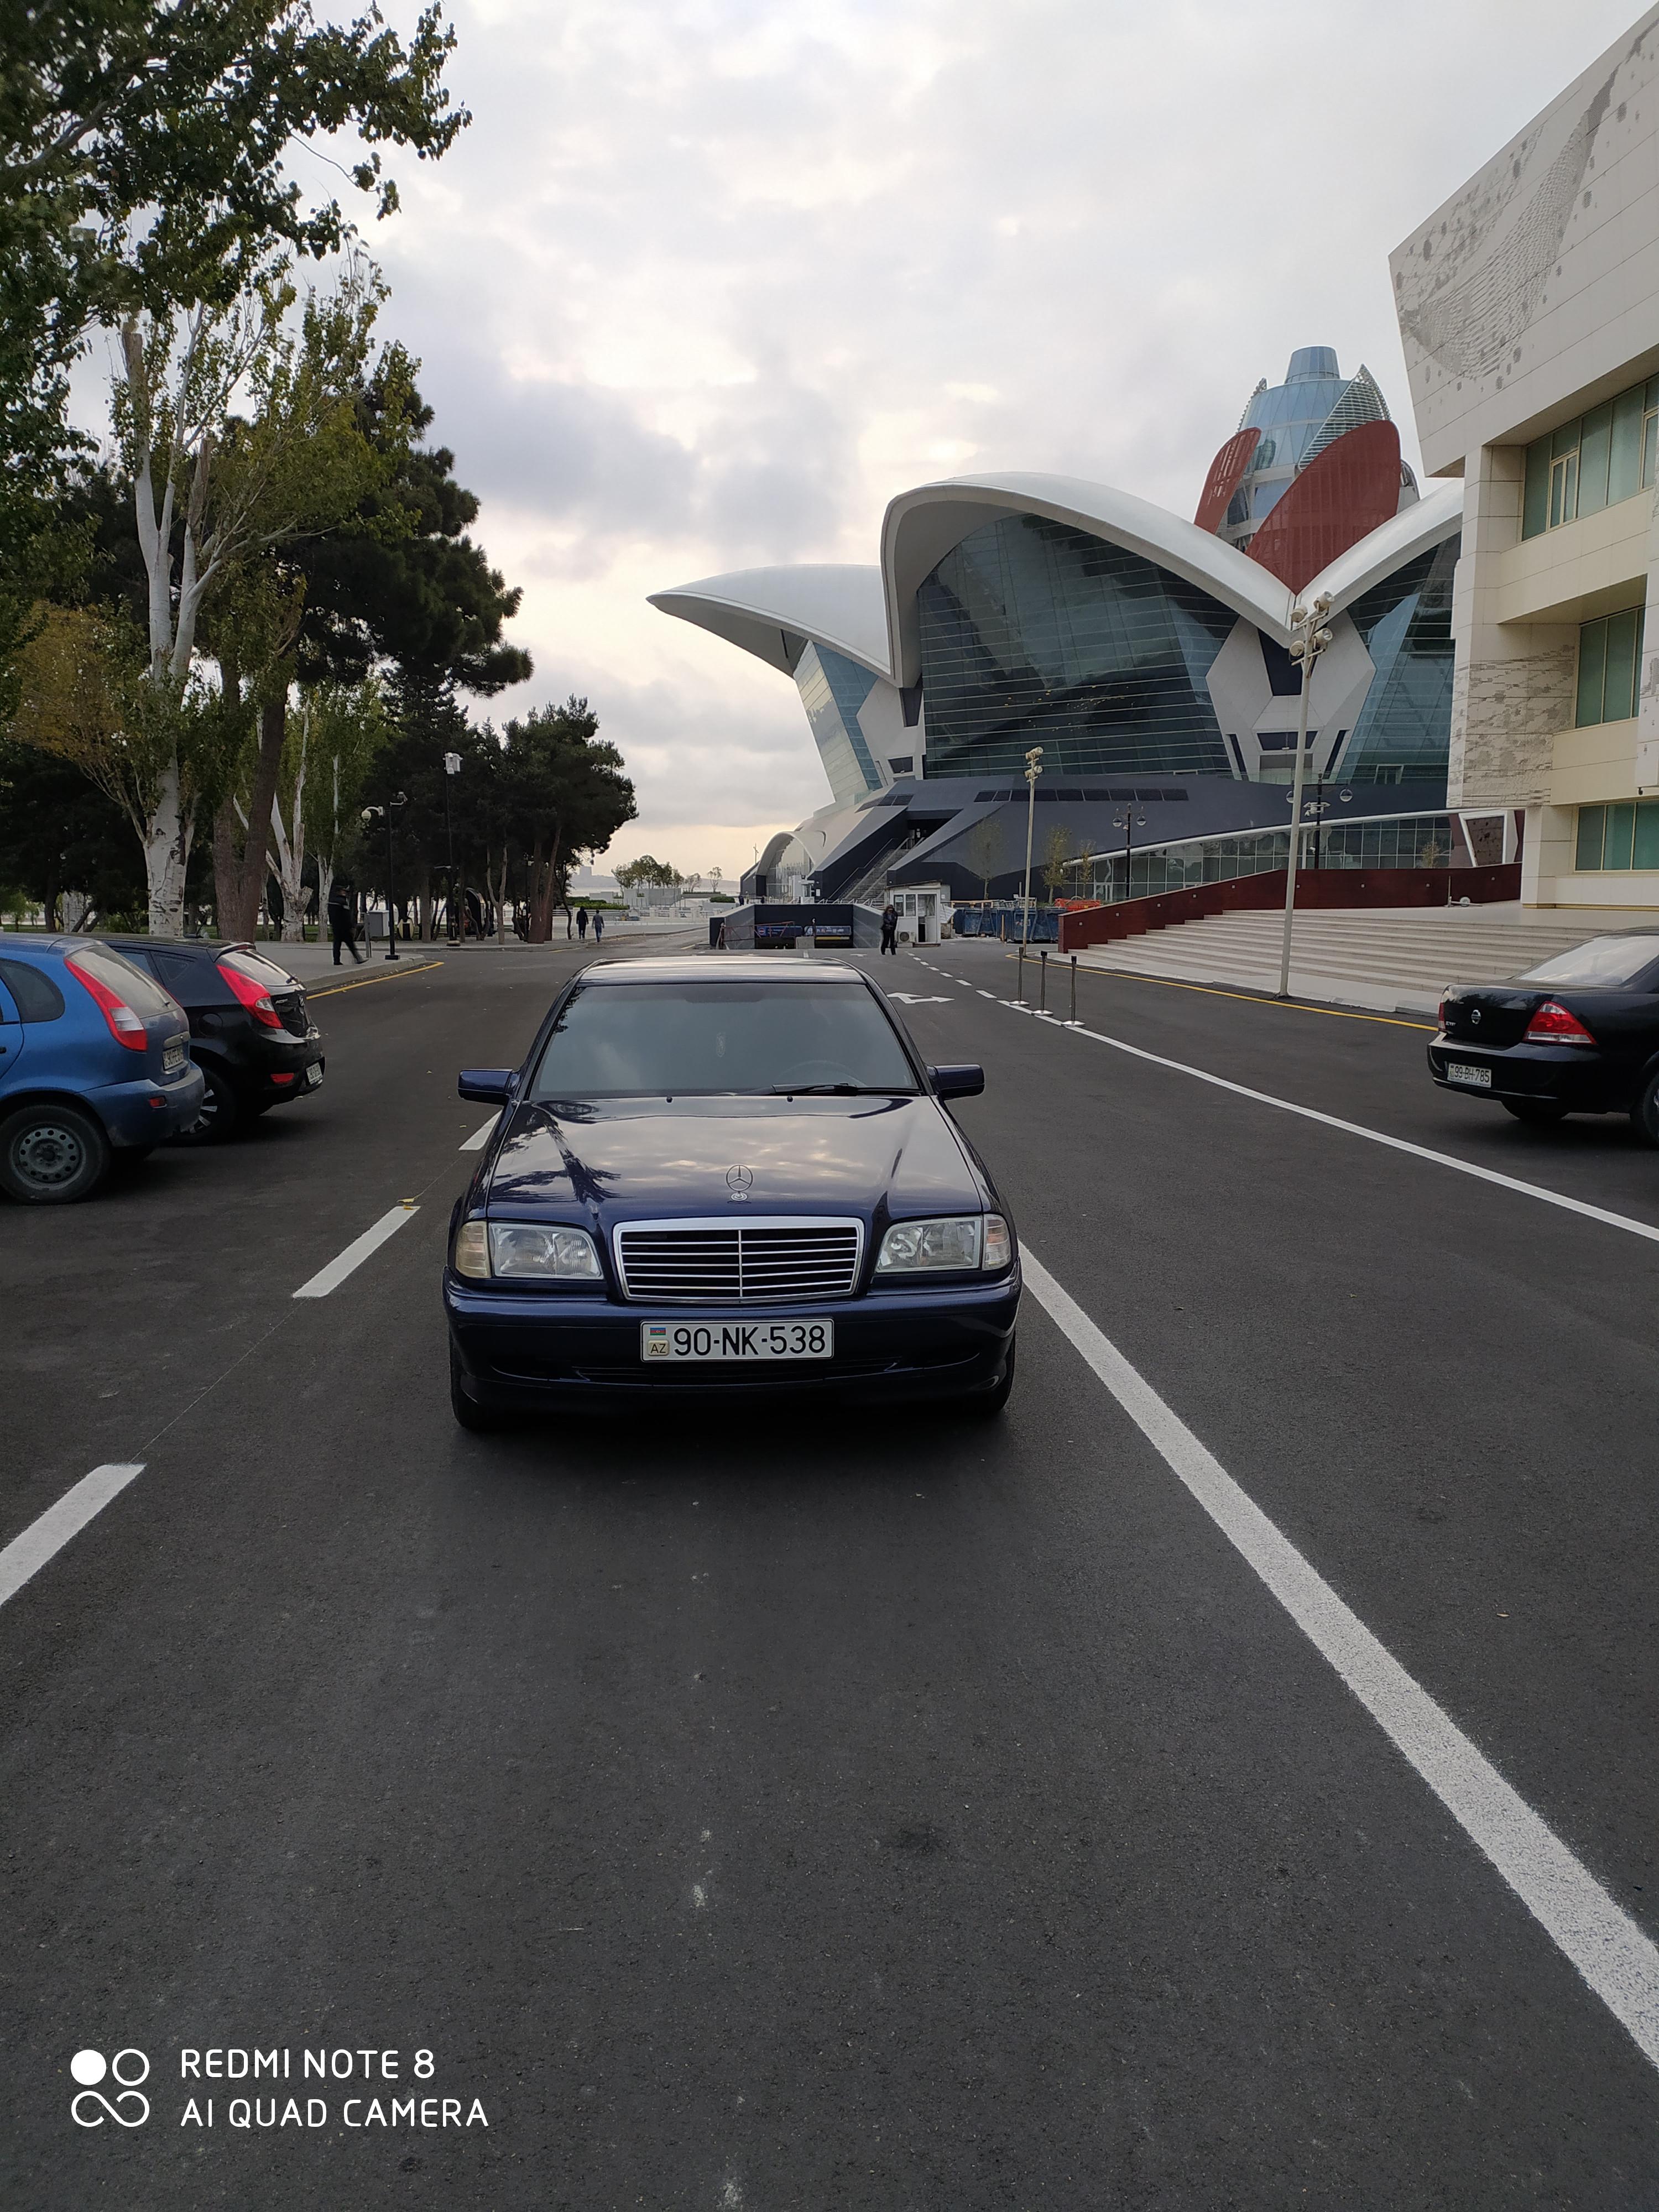 Mercedes-Benz C 180 1.8(lt) 1998 Second hand  $11200